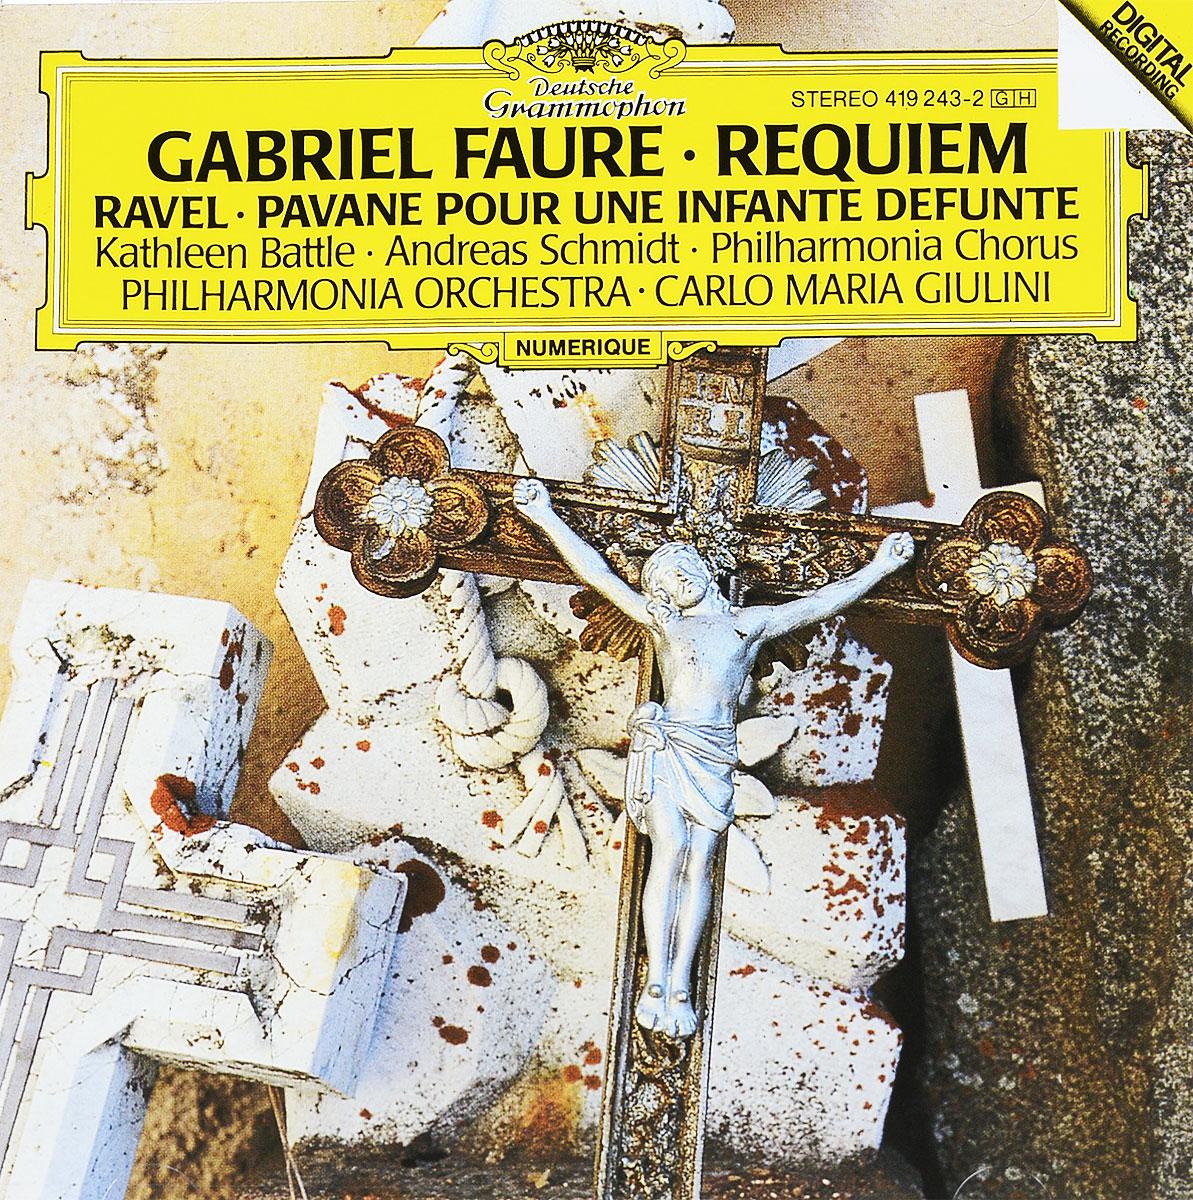 Карло Джулини,Андреас Шмидт,Кэтлин Баттл,Philharmonia Orchestra Gabriel Faure. Requiem / Maurice Ravel. Pavane Pour Une Infante Defunte sir neville marriner faure requiem